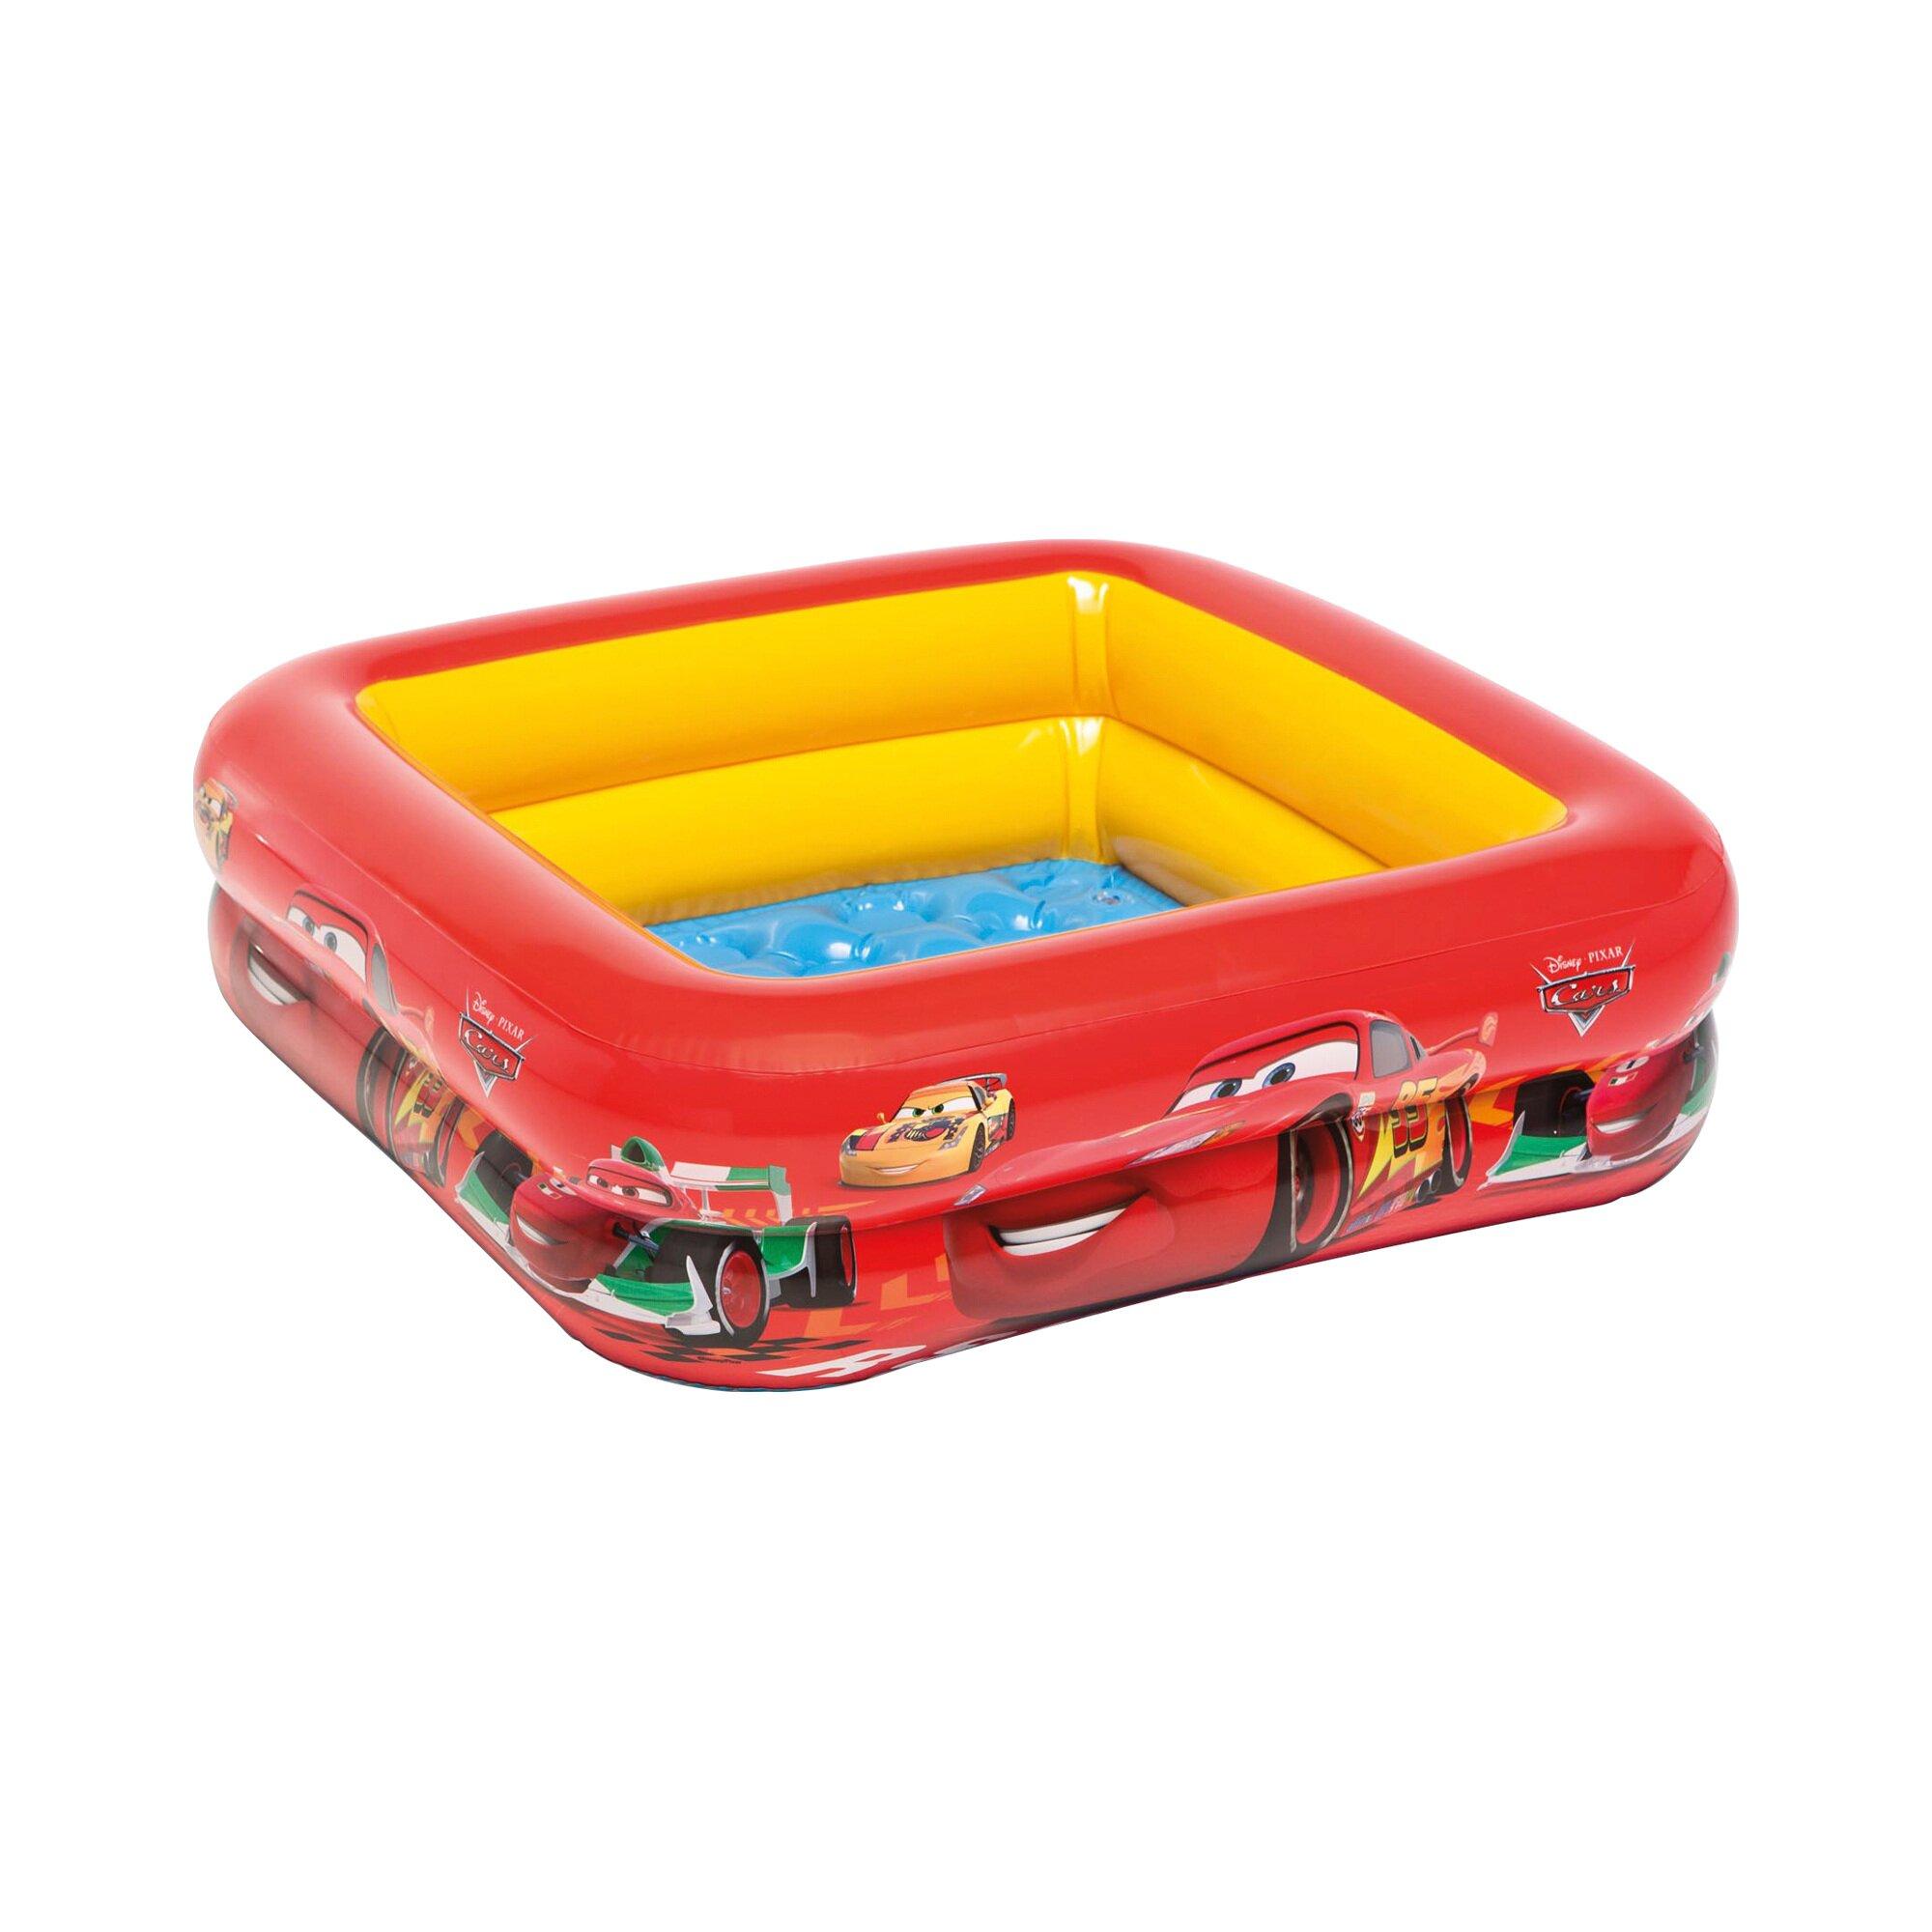 zur InfoseiteDisney Cars<br>Baby-Pool